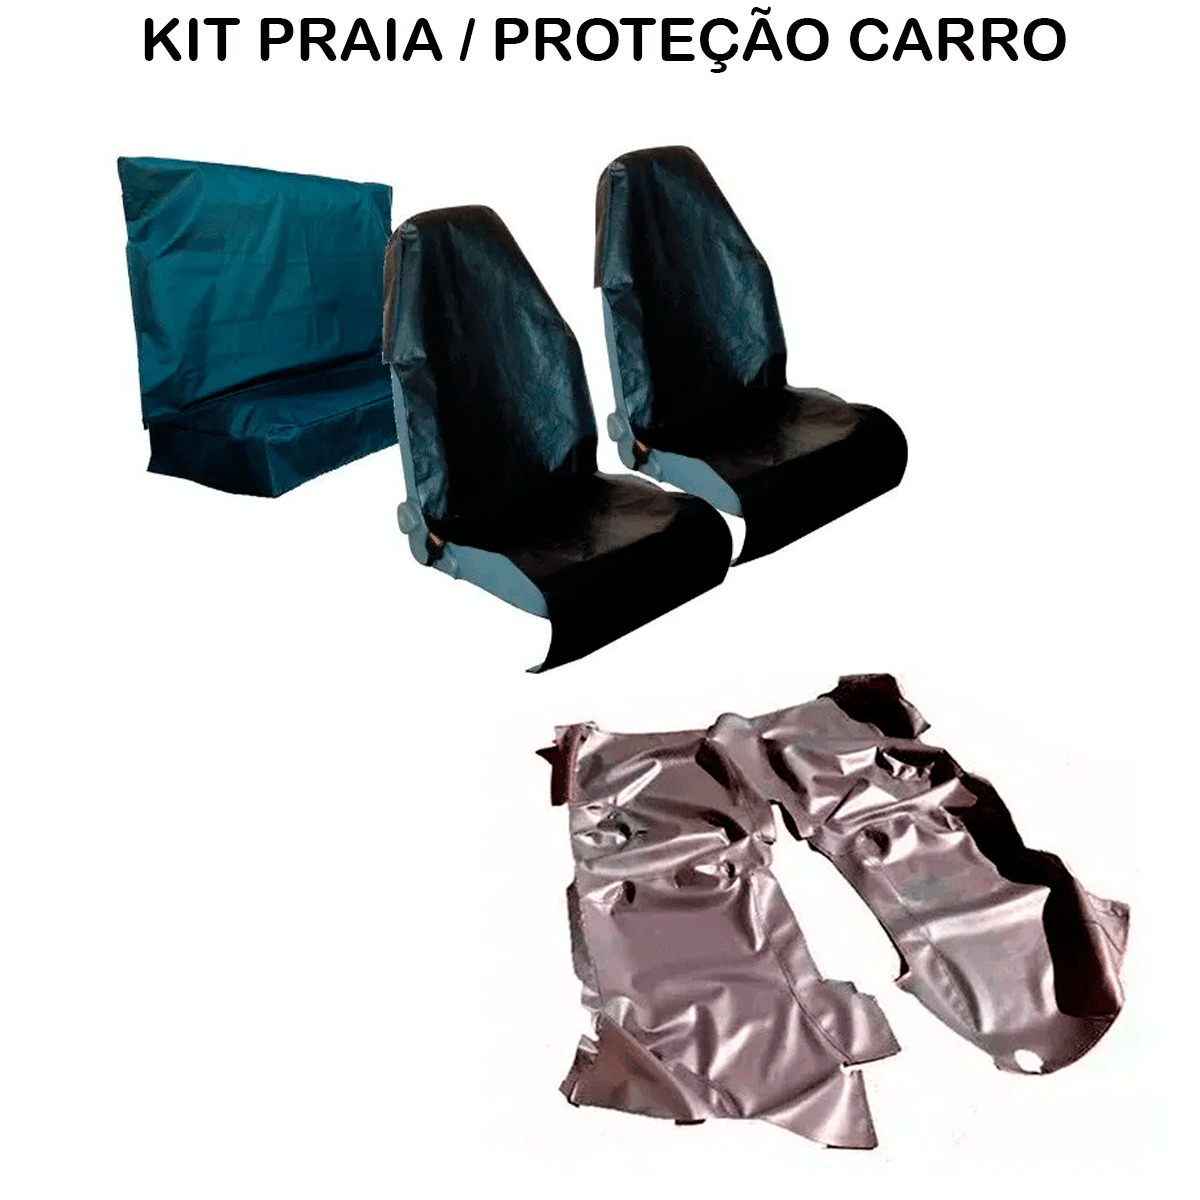 Tapete Em Vinil Renault Duster 2015 a 2019 + Capa Banco Protecao Banco Areia Suor Academia